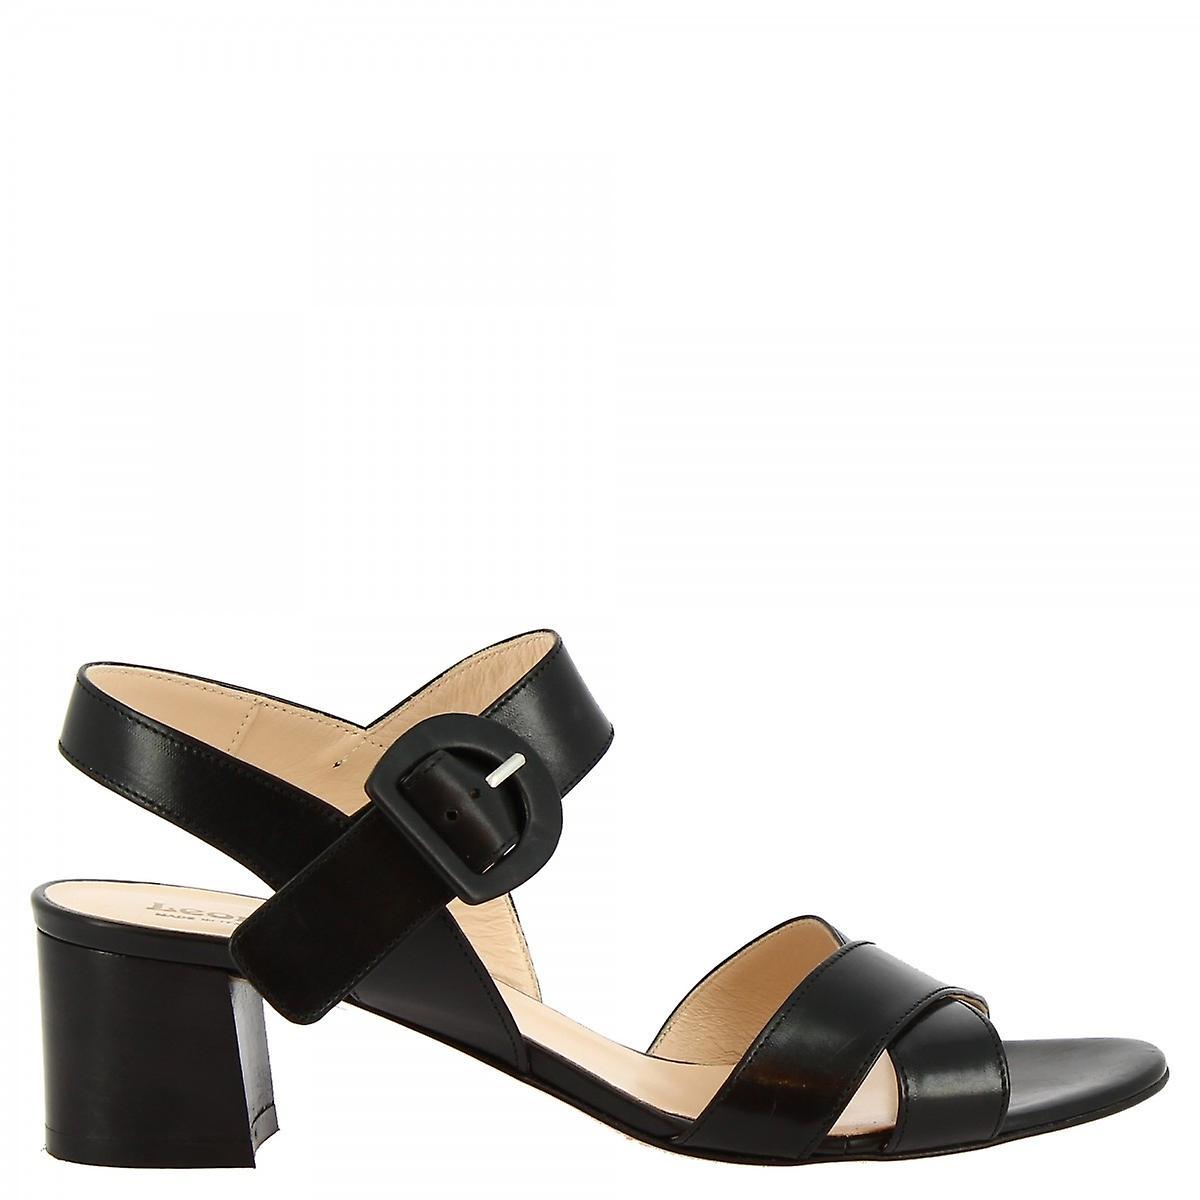 Leonardo Shoes Women's handmade mid heels sandals black leather buckle closure